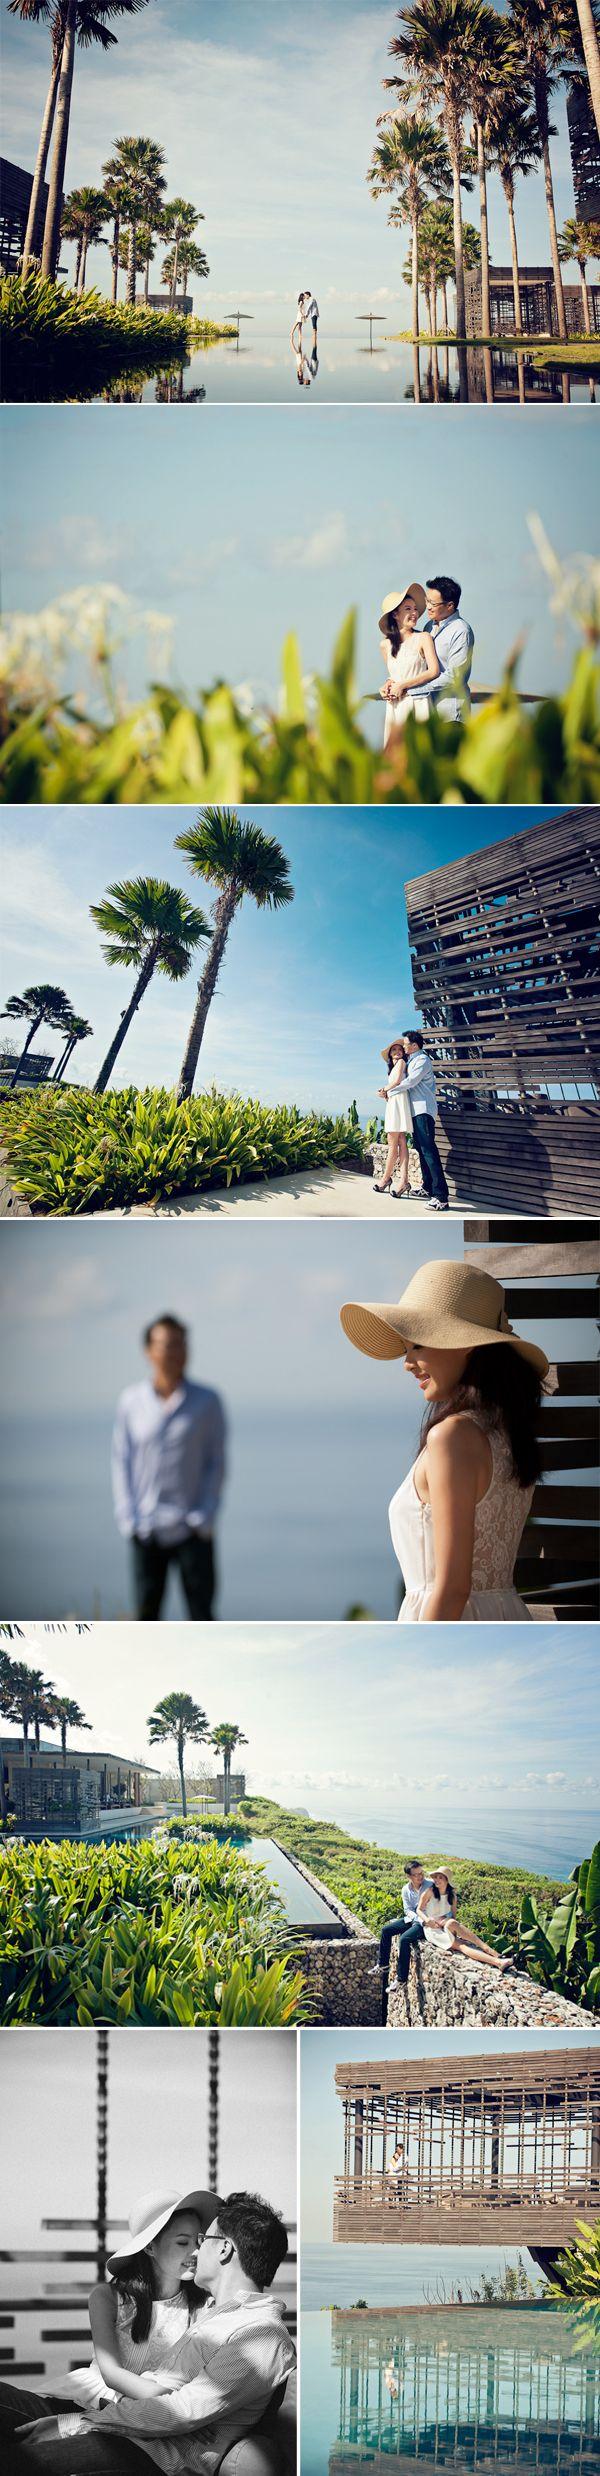 Bali Pre-Wedding Session from Daren Chong - Praise Wedding